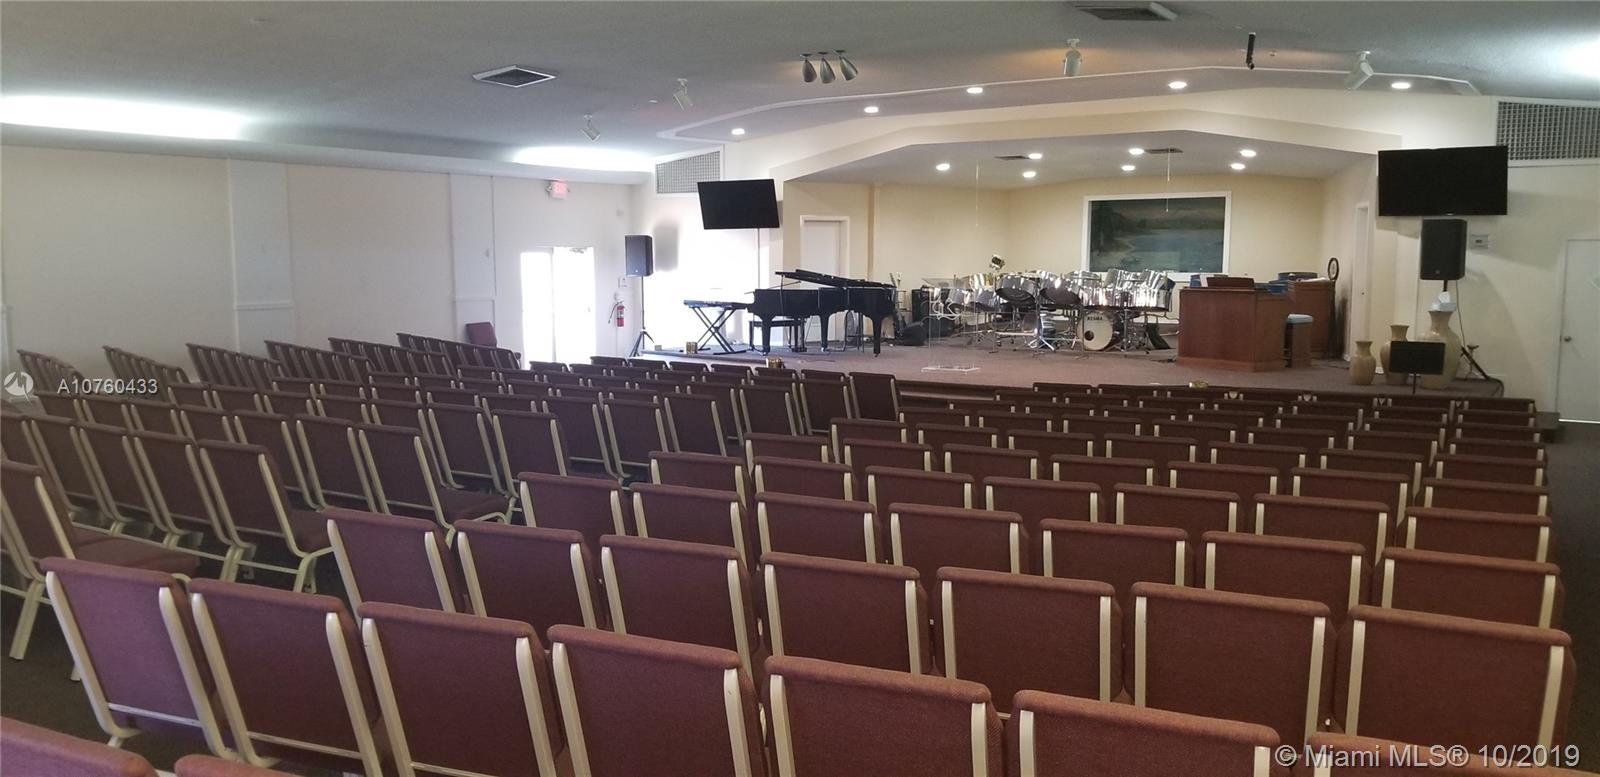 , Fort Lauderdale, FL 33304